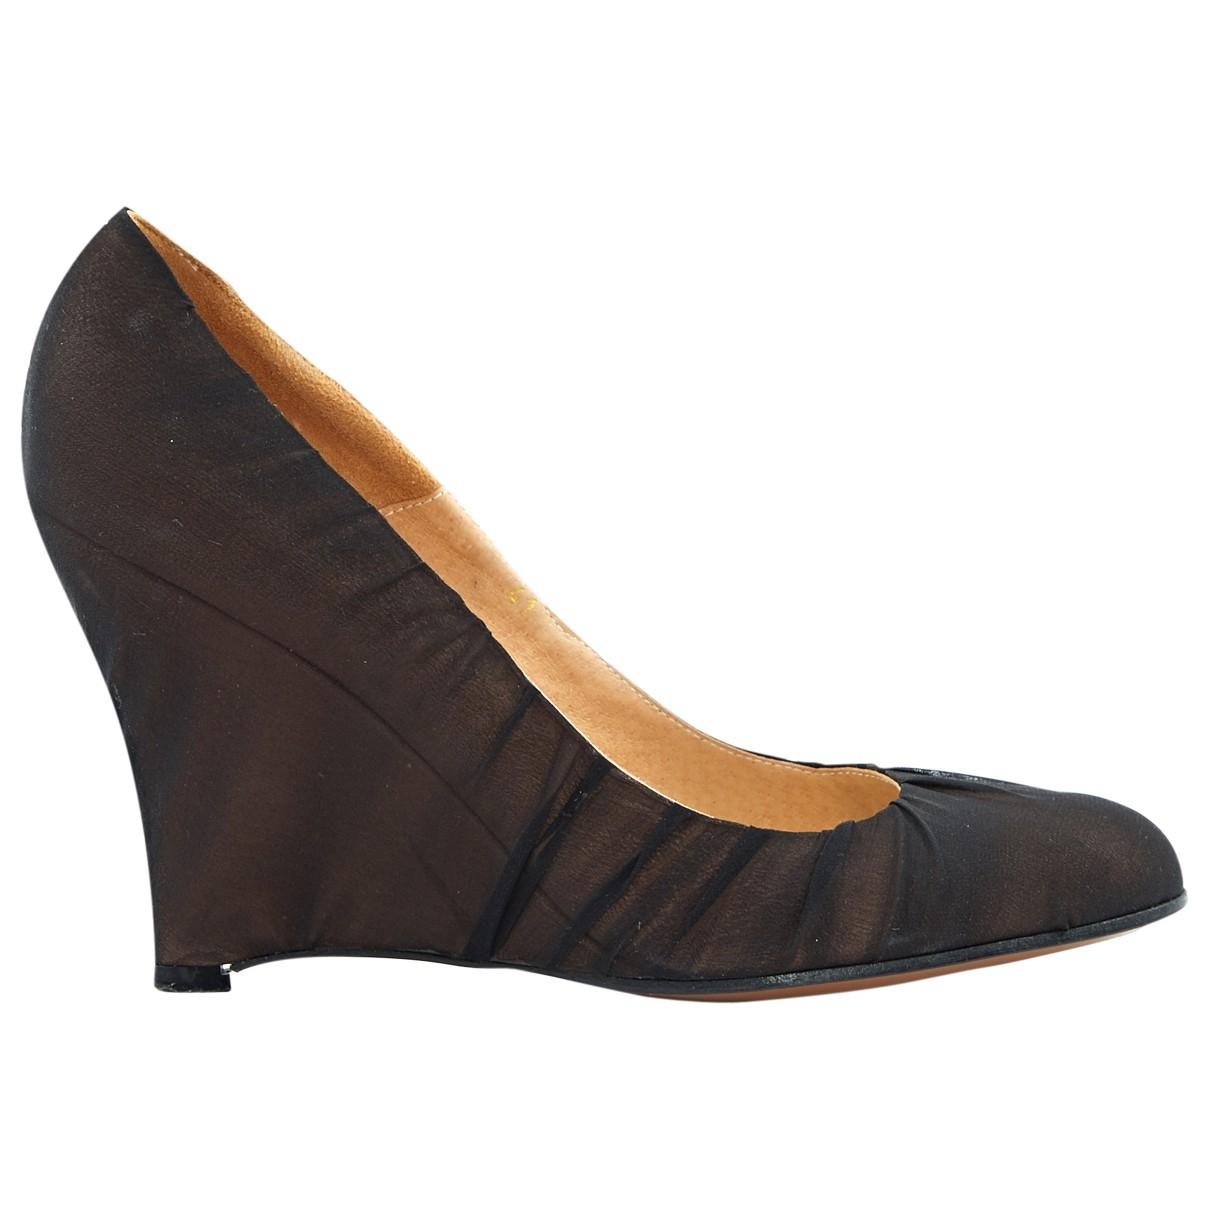 Maison Martin Margiela \N Black Cloth Heels for Women 41 EU